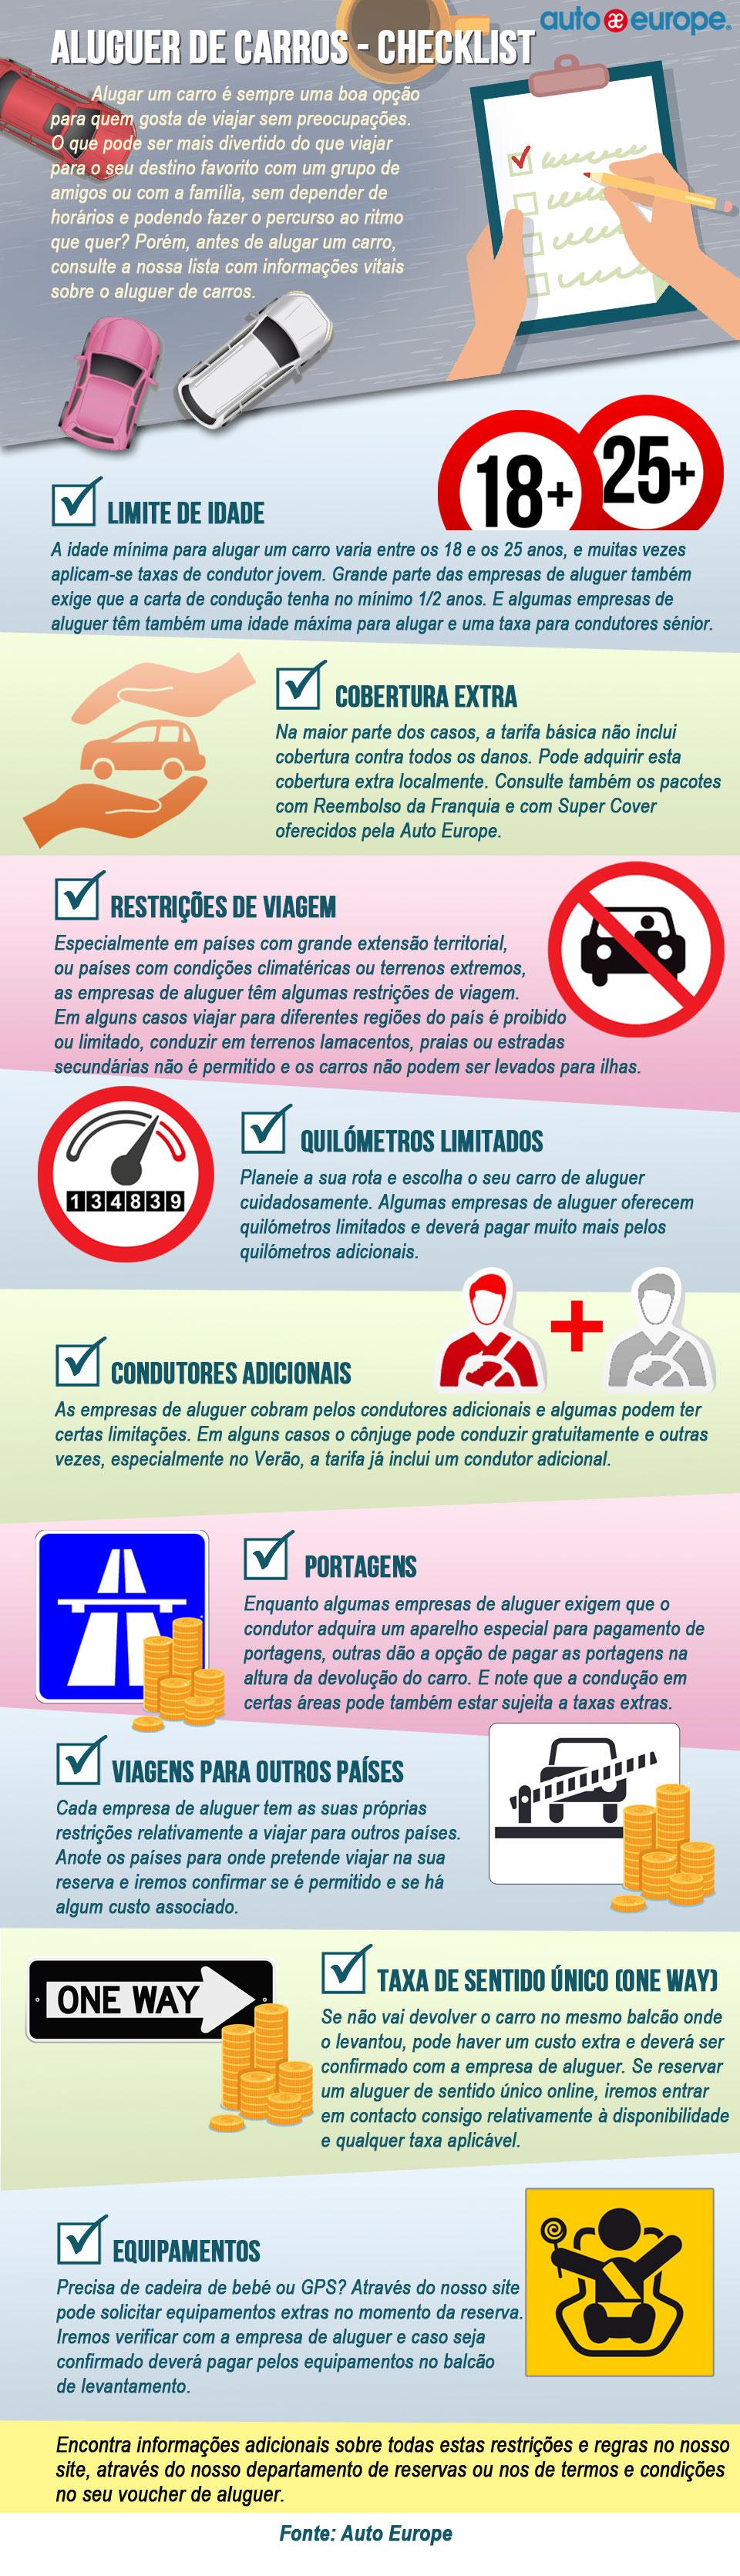 Aluguer de Carros - Checklist